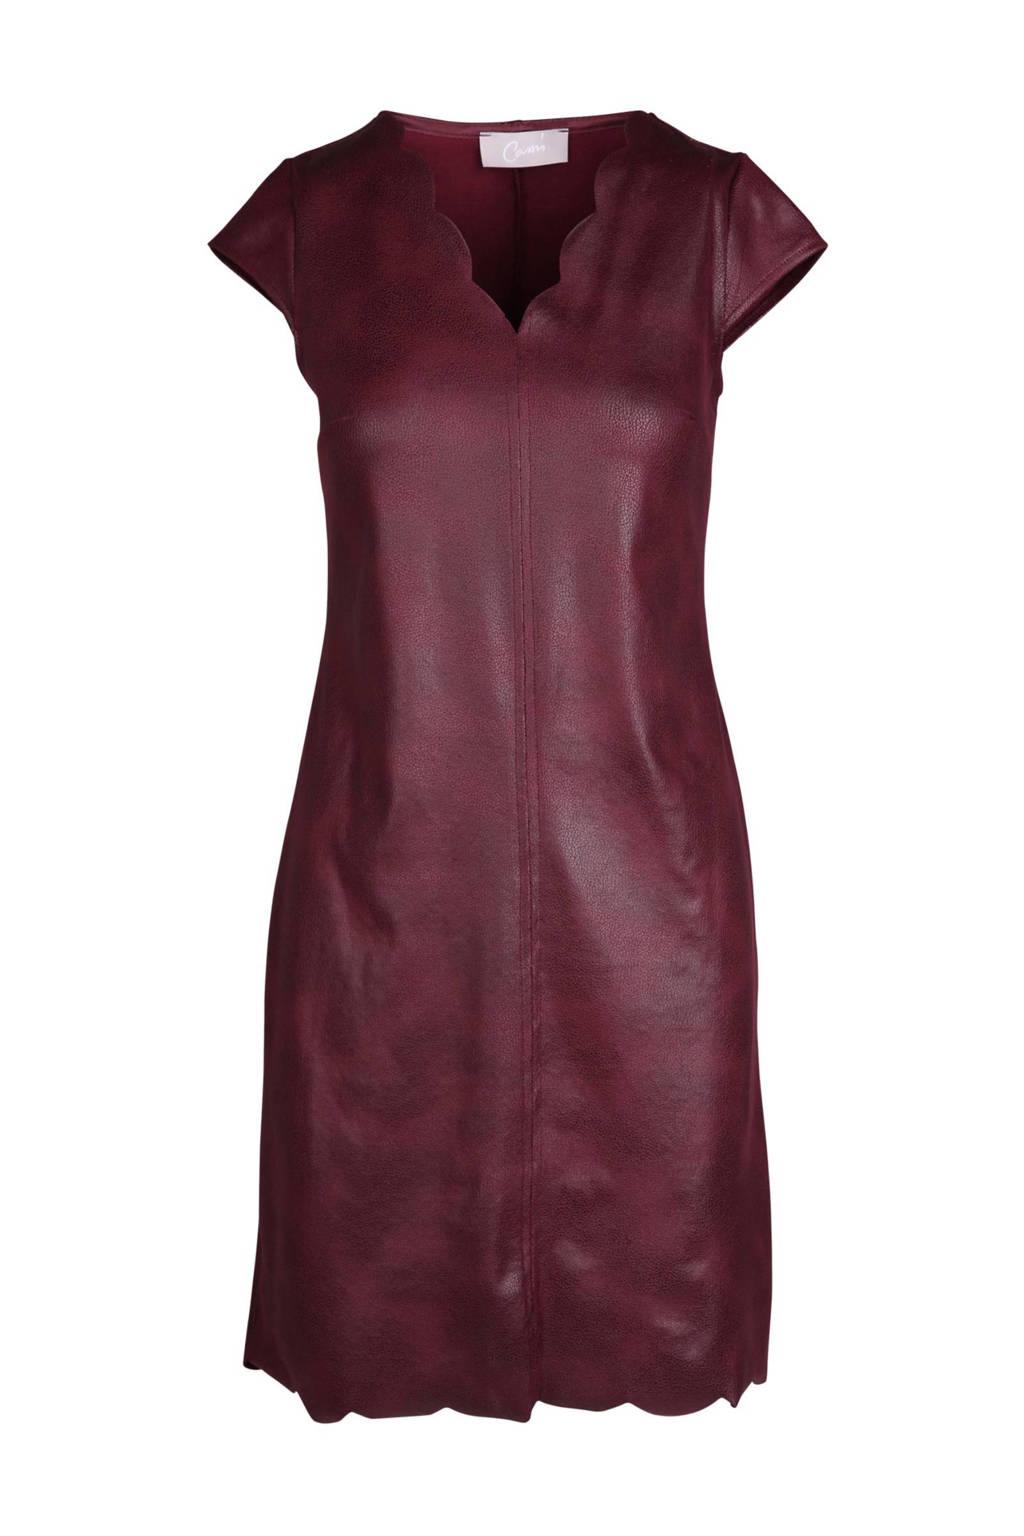 Cassis suèdine jurk, Wijnrood